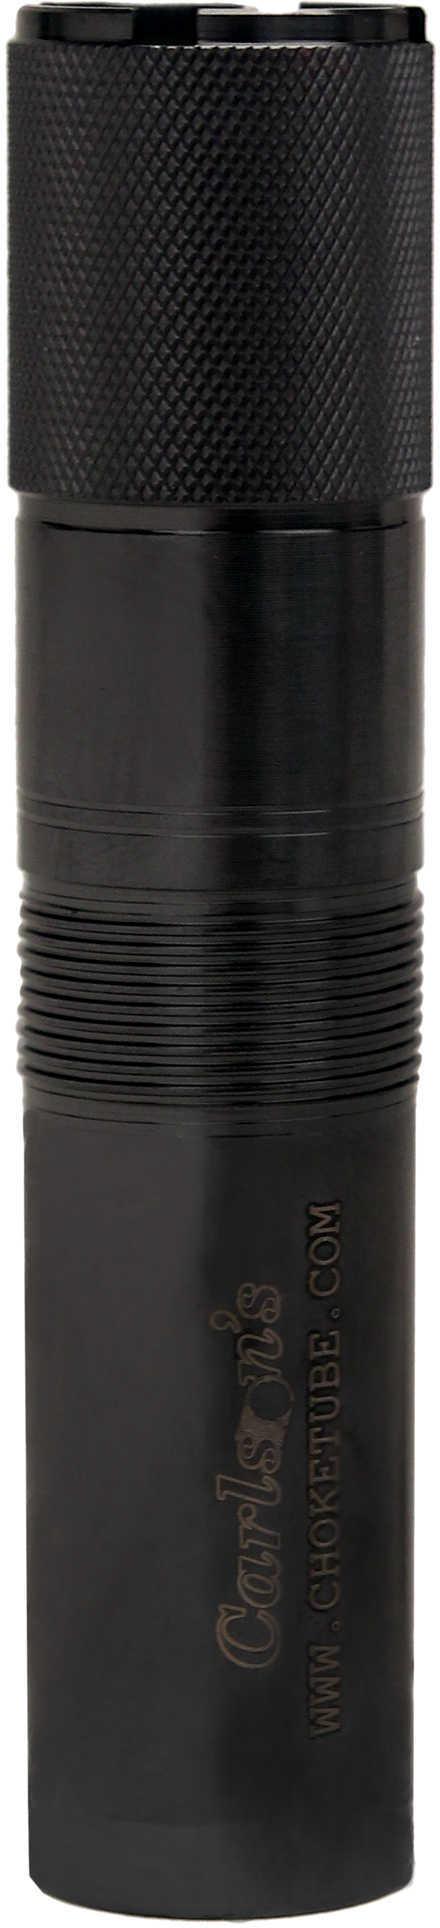 Carlson's Black Cloud Choke Tube Optima Plus, Mid Range, 12 Gauge Md: 09012